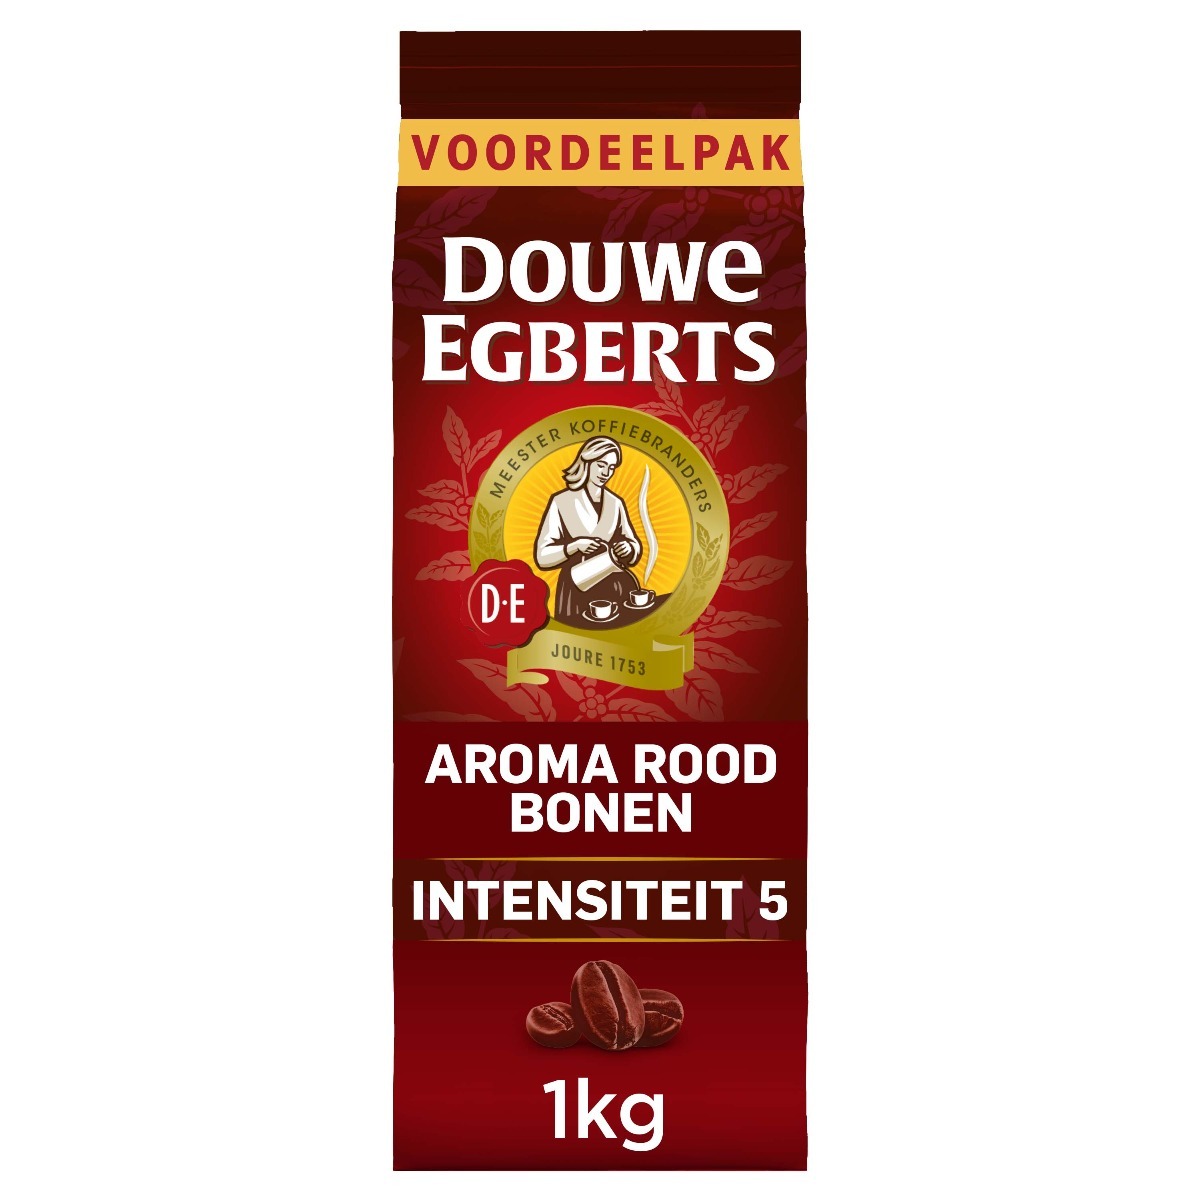 Douwe Egberts - koffiebonen - Aroma Rood Voordeelpak